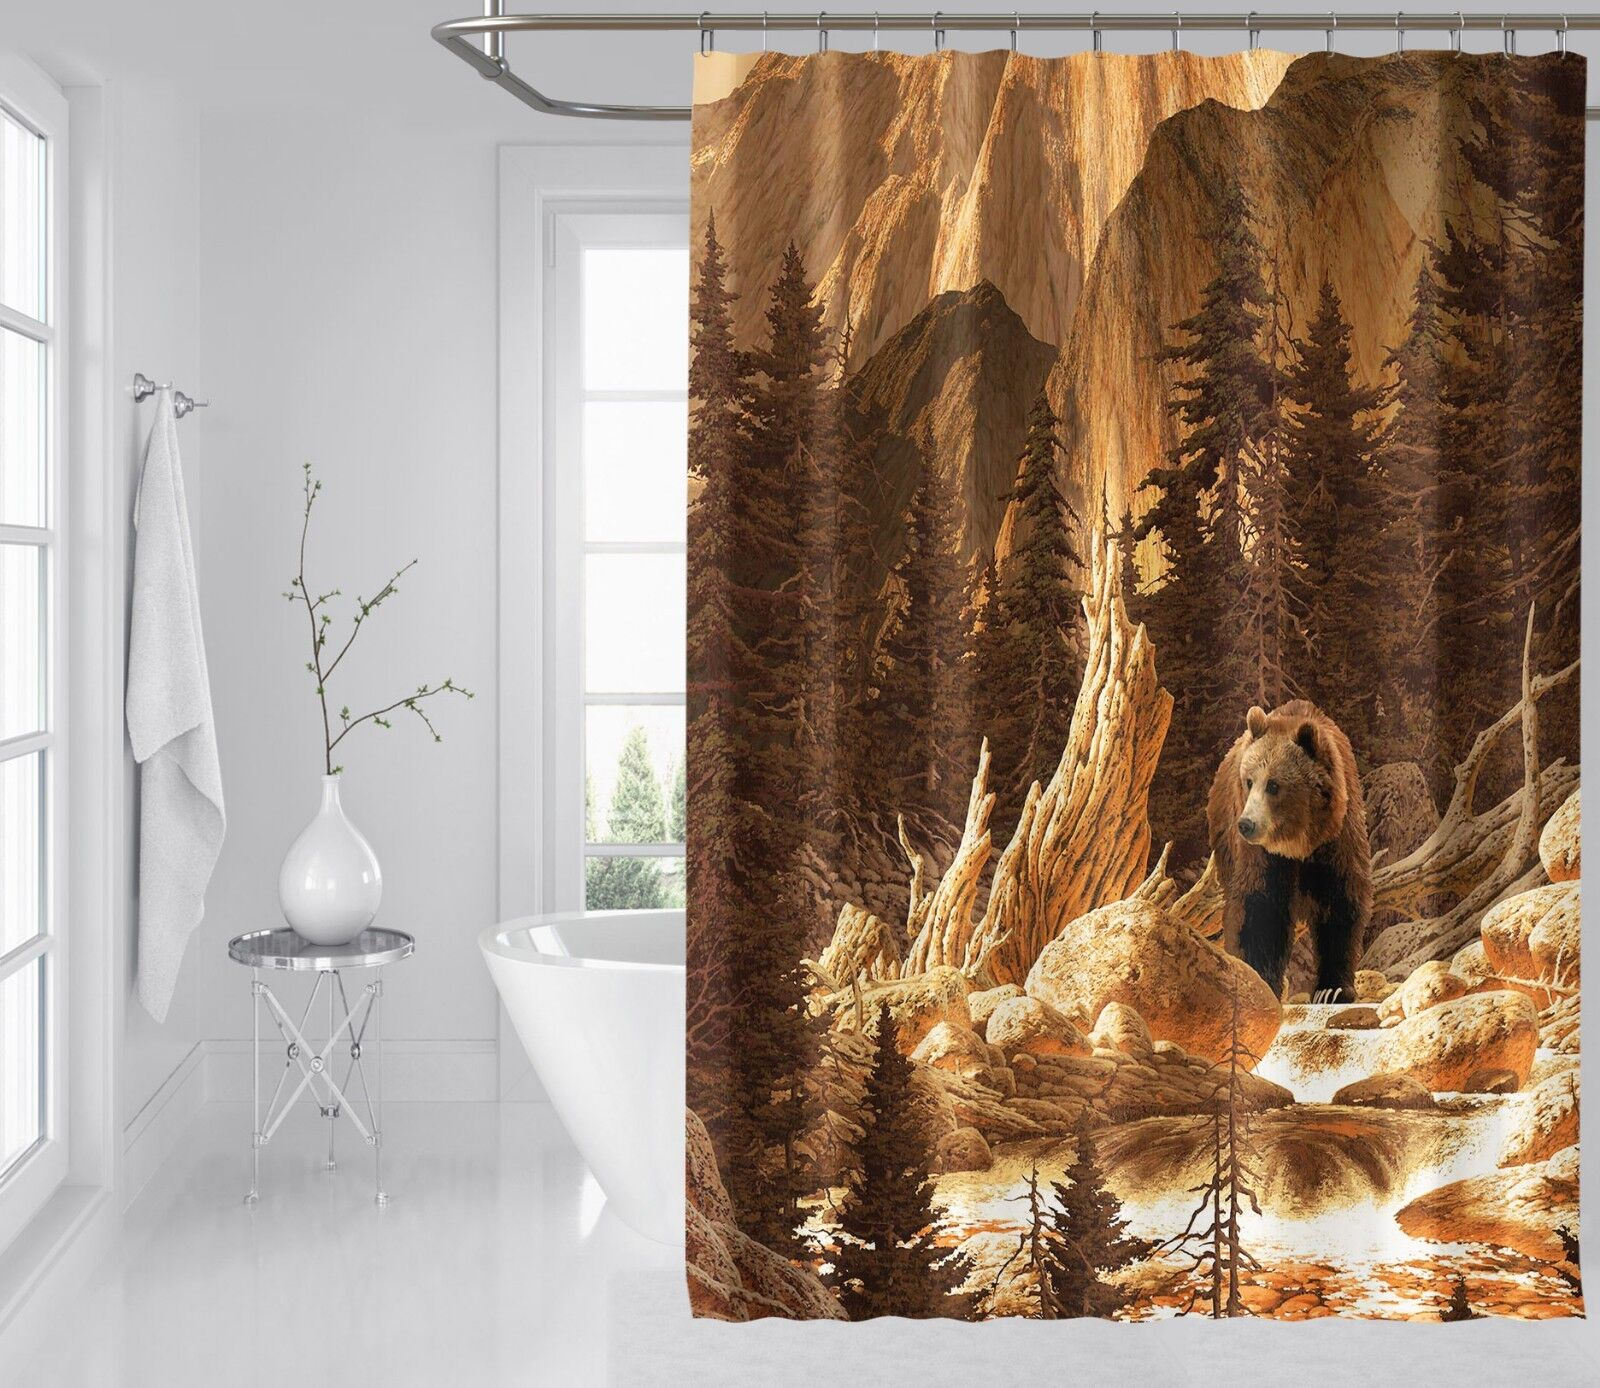 3D Grizzly Wald Wald Wald 7 Duschvorhang Wasserdicht Faser Bad Daheim Windows Toilette DE | Abgabepreis  467c20